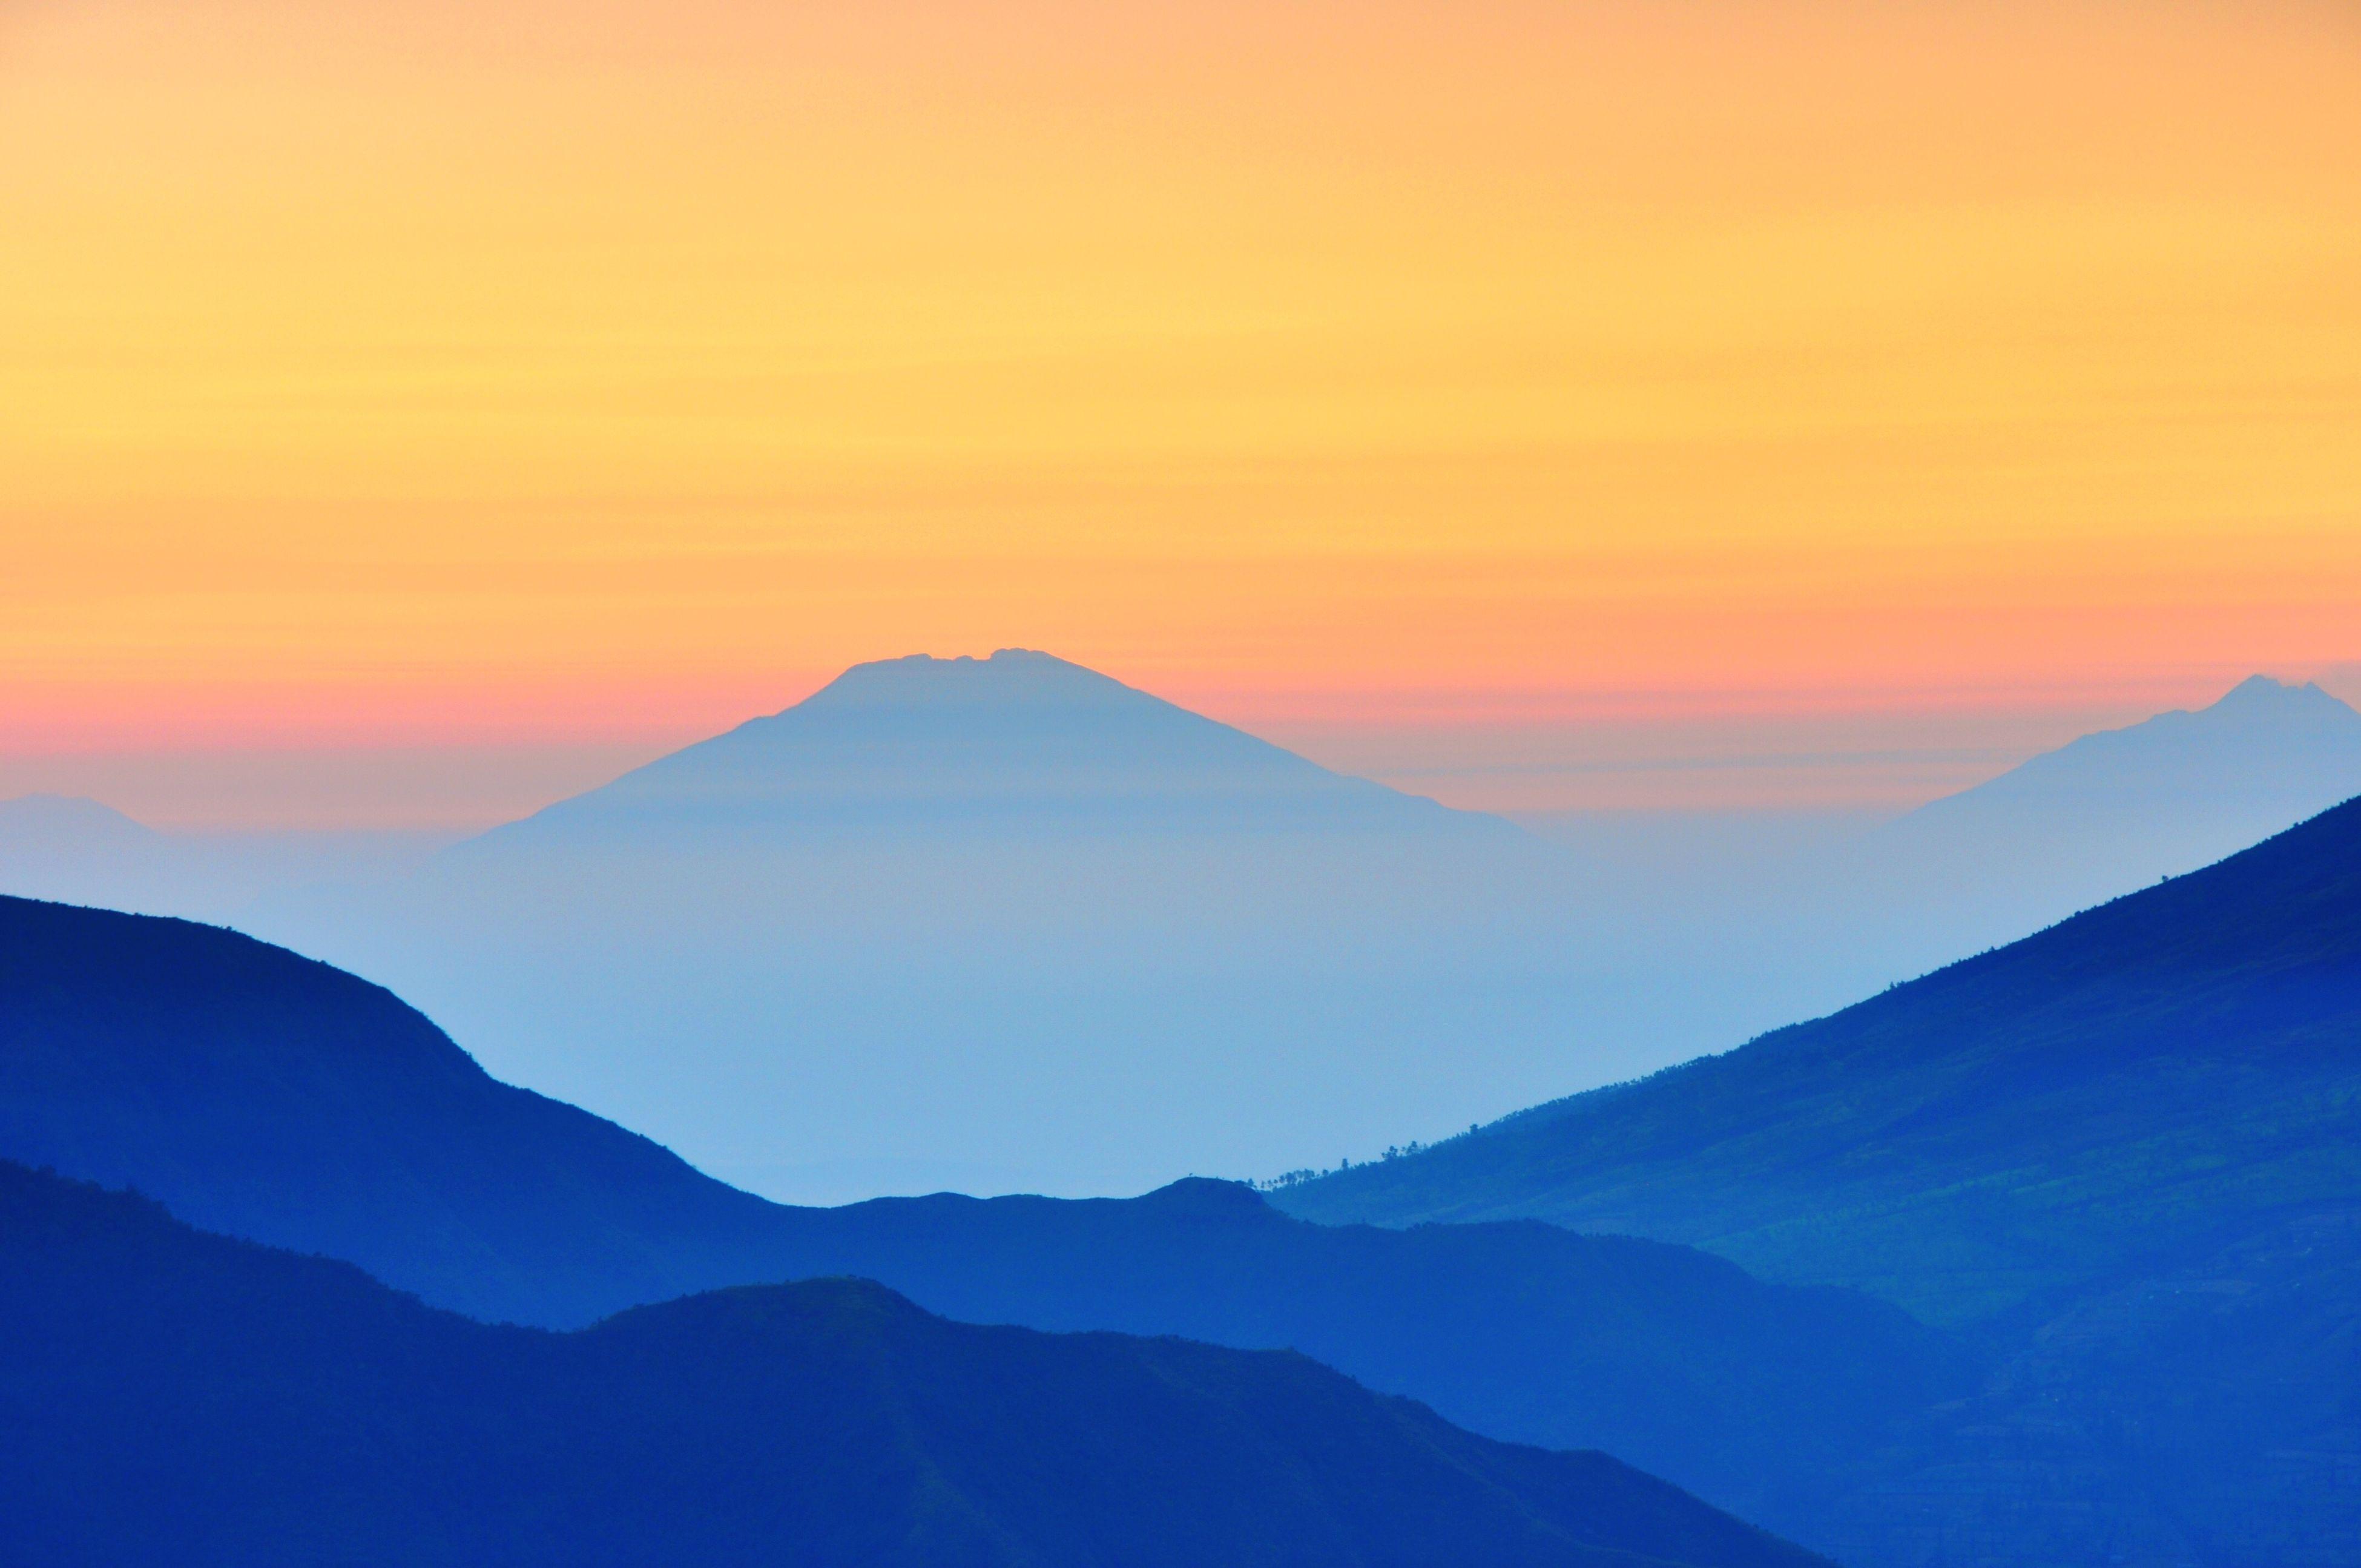 mountain, sunset, scenics, tranquil scene, mountain range, tranquility, beauty in nature, orange color, idyllic, nature, landscape, sky, silhouette, non-urban scene, majestic, copy space, remote, no people, dusk, fog